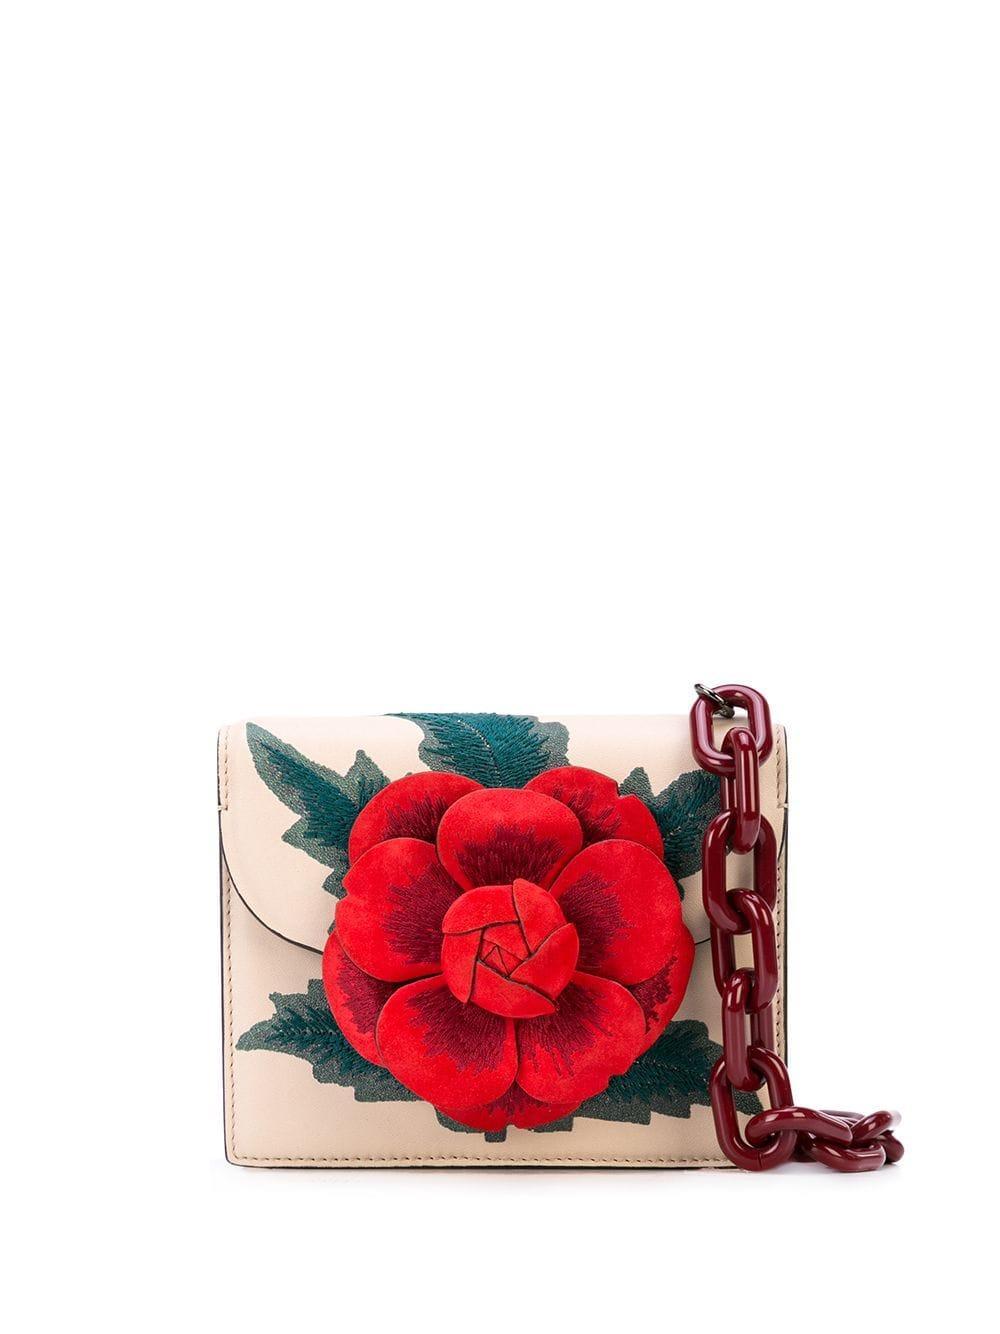 Mini Tro Calfskin With Embroidery